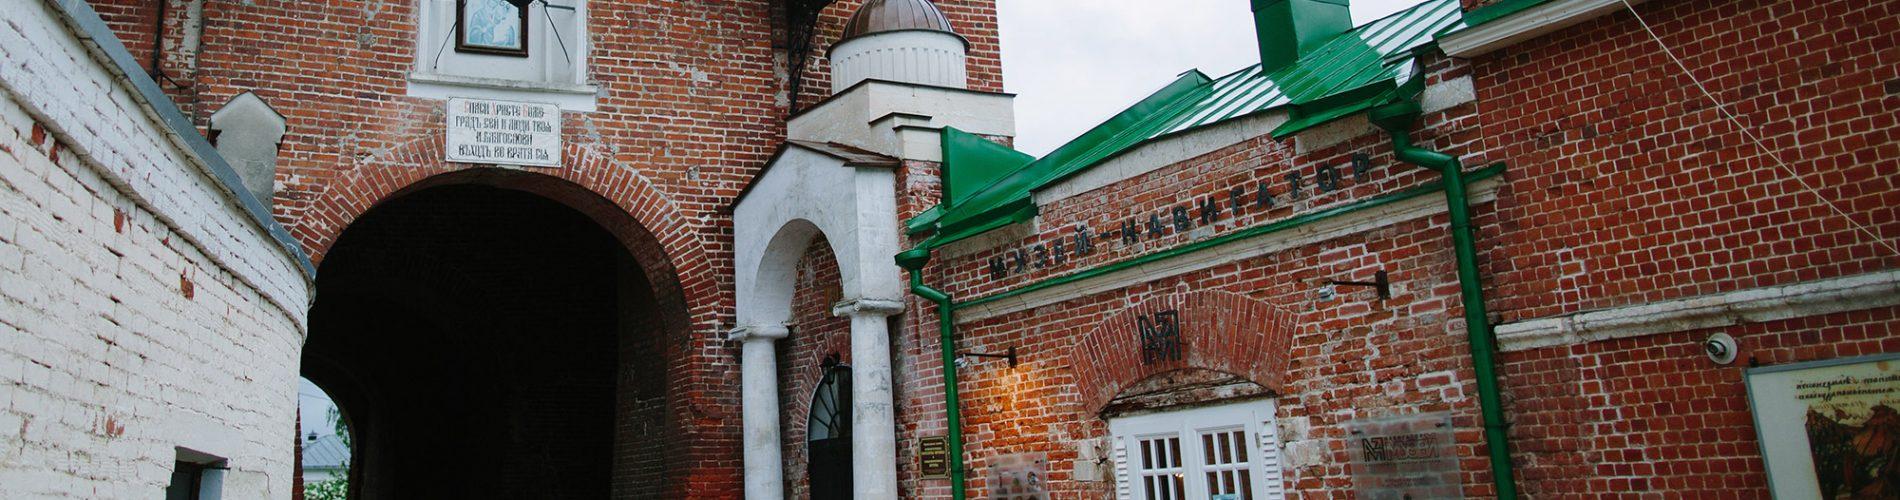 Музей «Навигатор» в Коломне